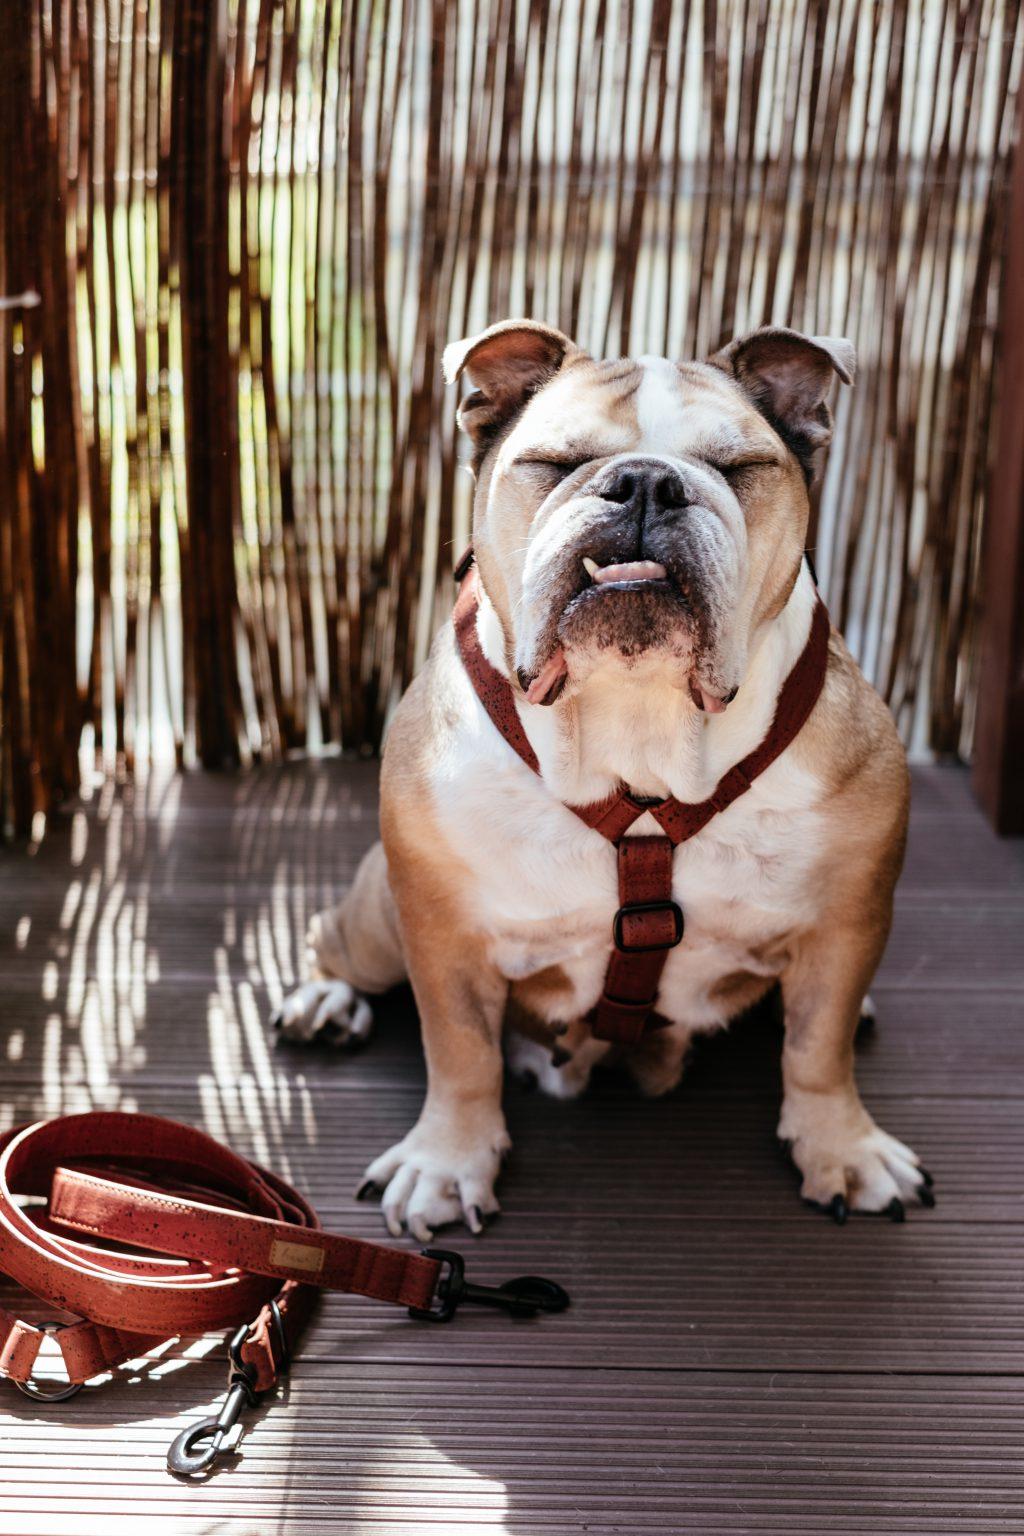 English Bulldog in a harness 3 - free stock photo